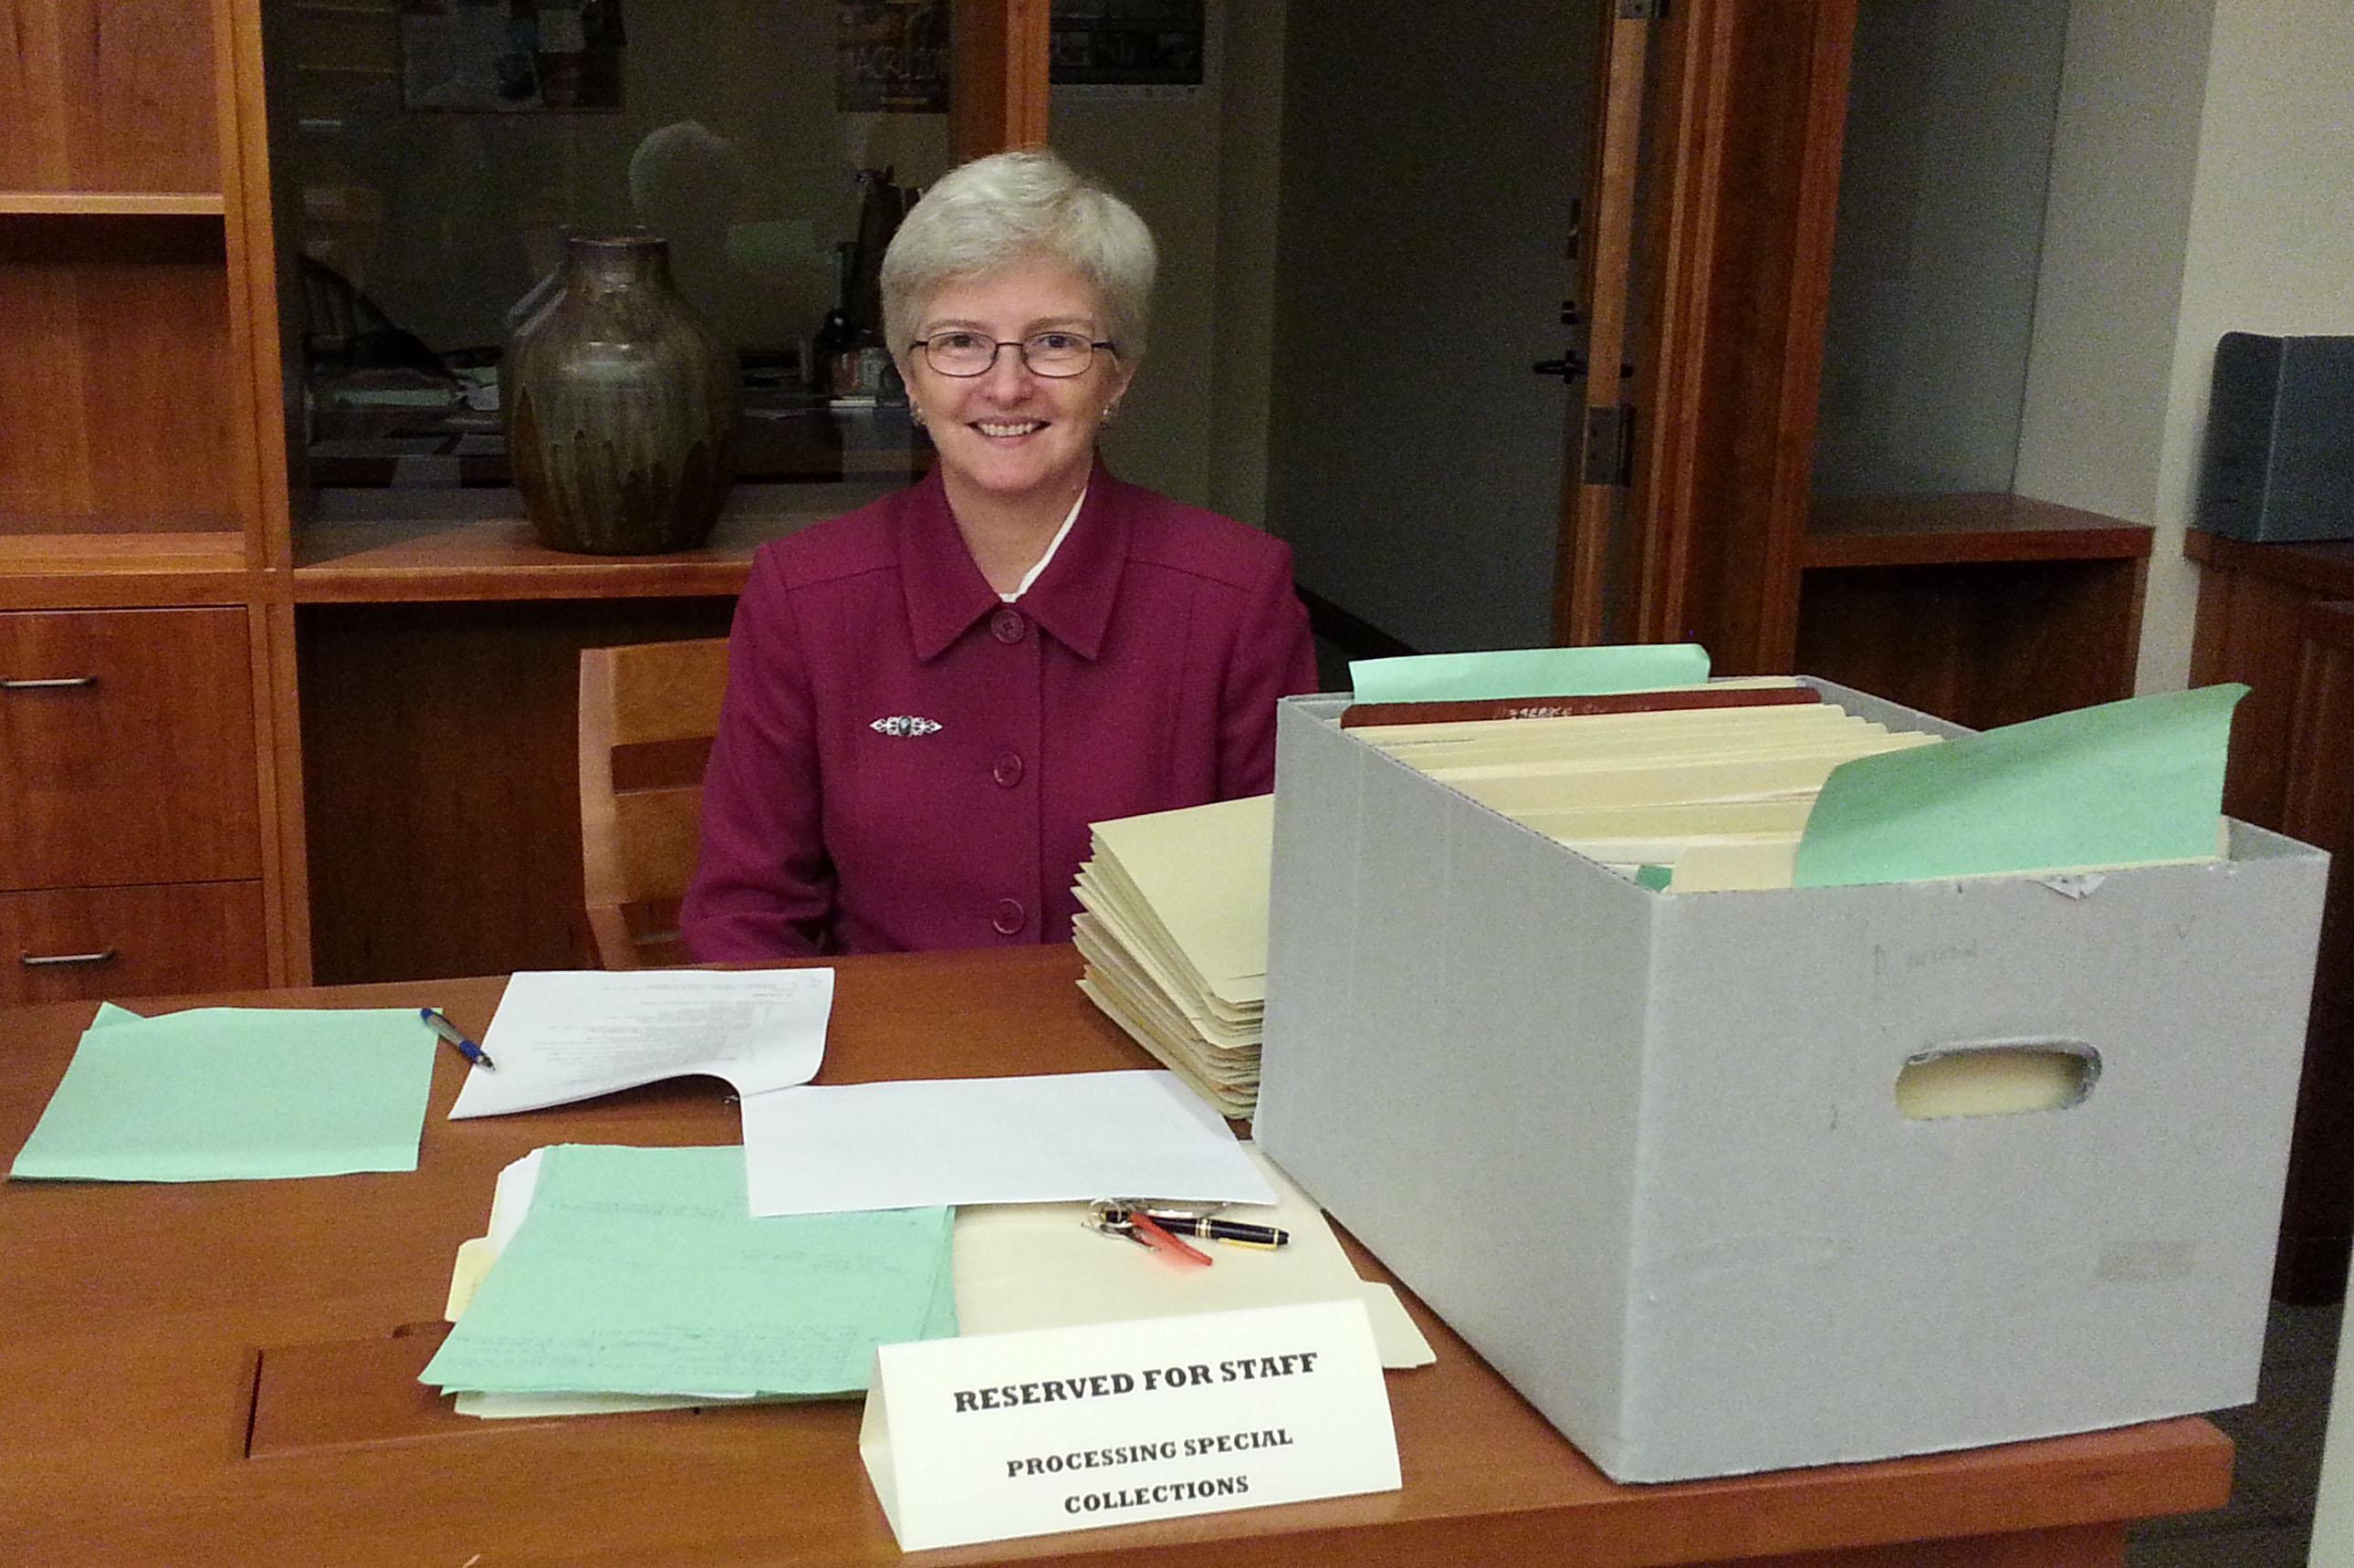 Karen Parshall, Honorary Archival Processor Extraordinaire.